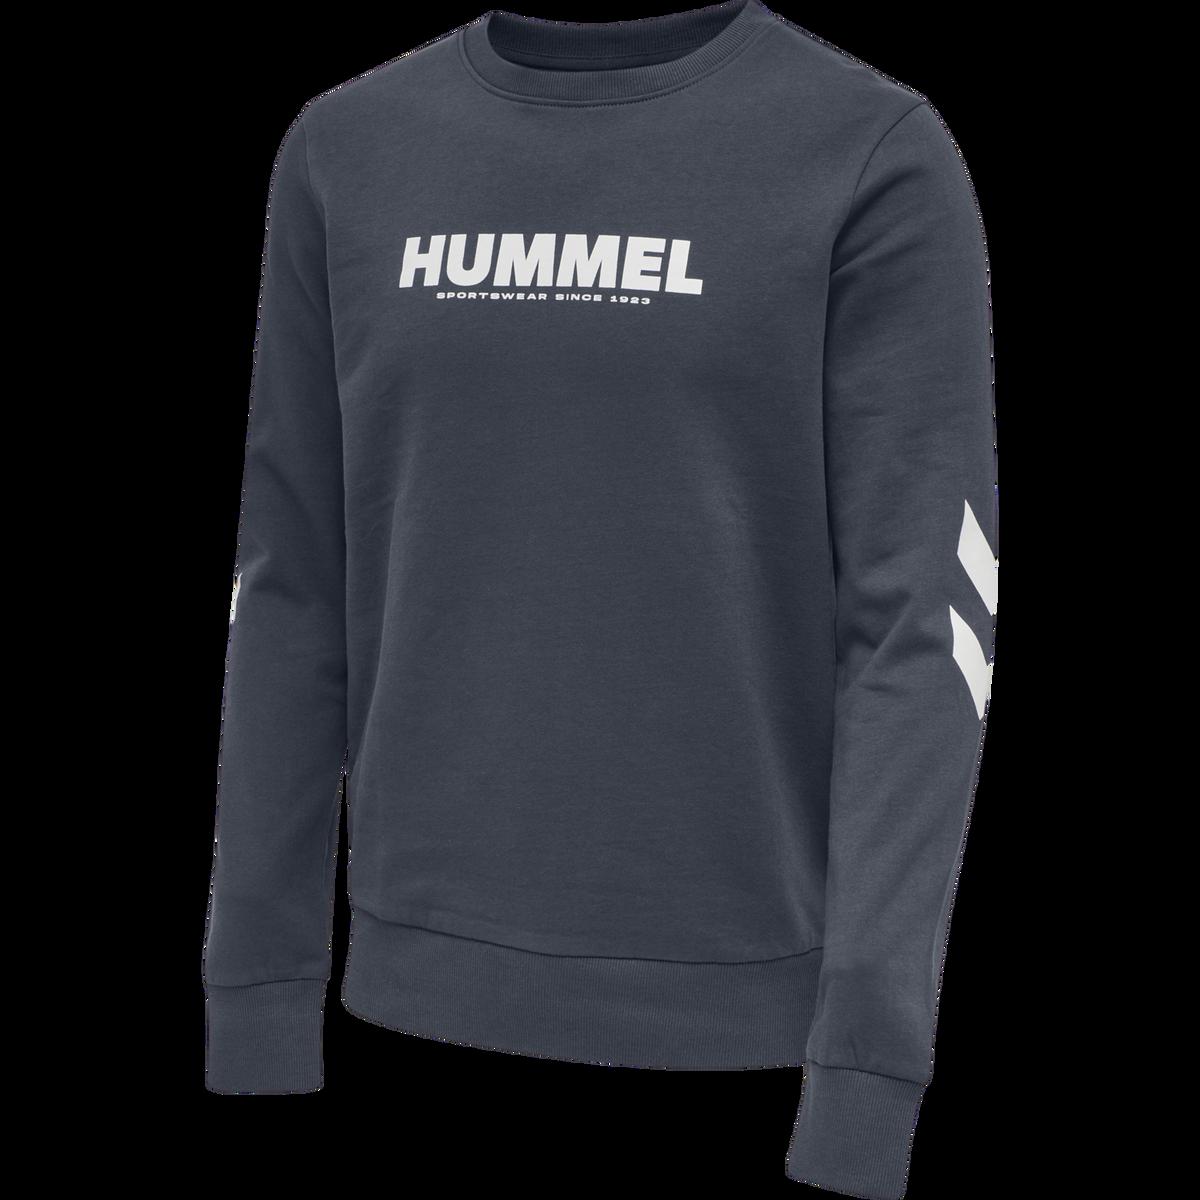 hummel Legacy Sweatshirt